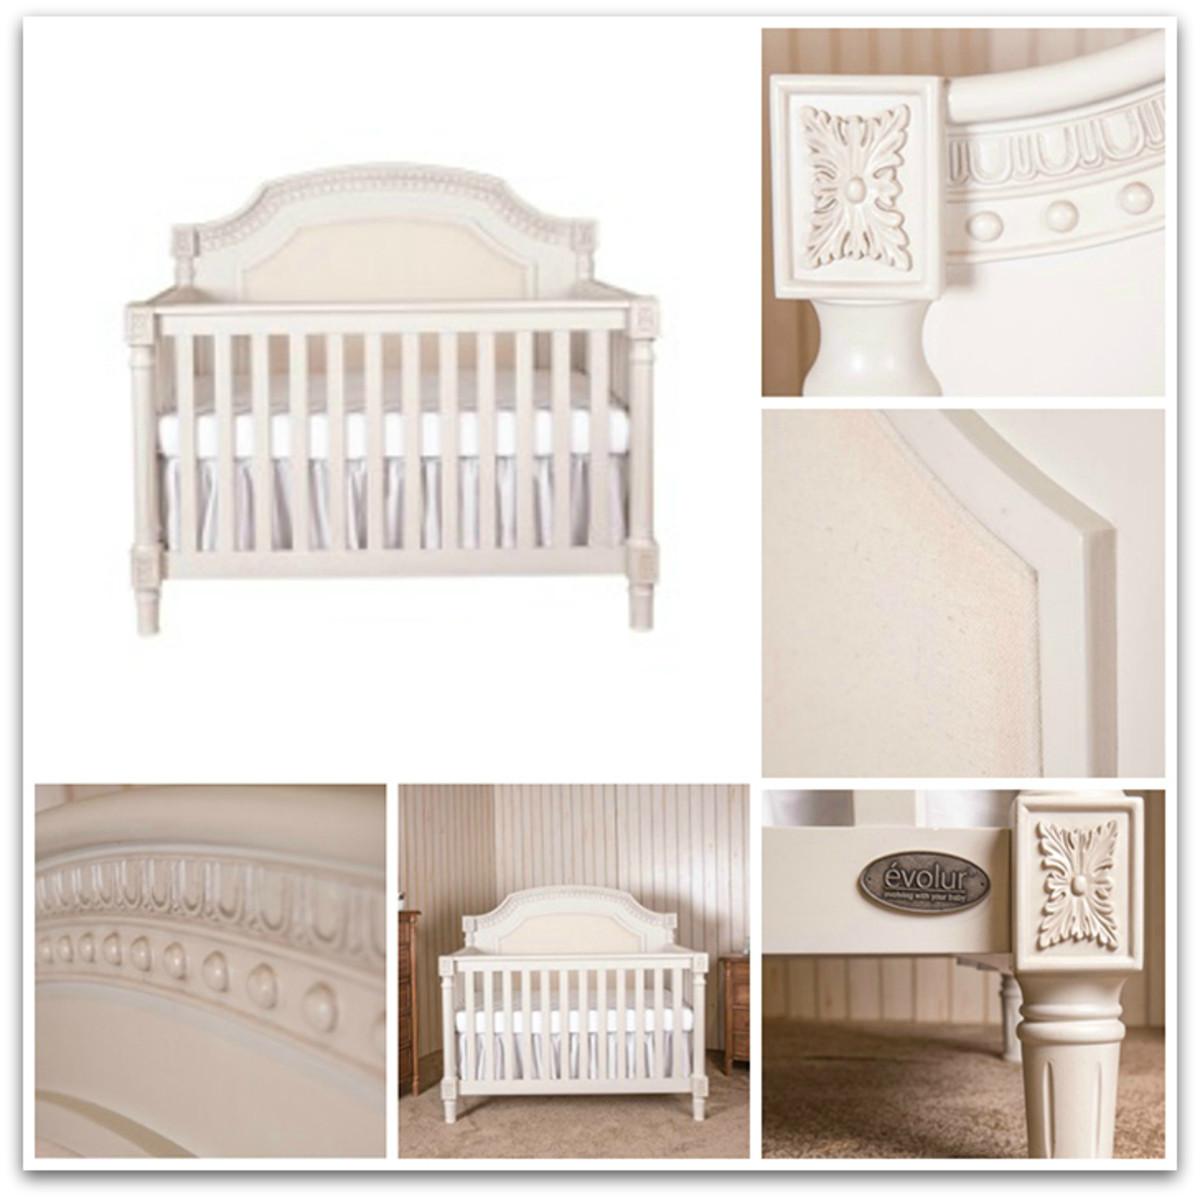 DOM Family Evolur crib